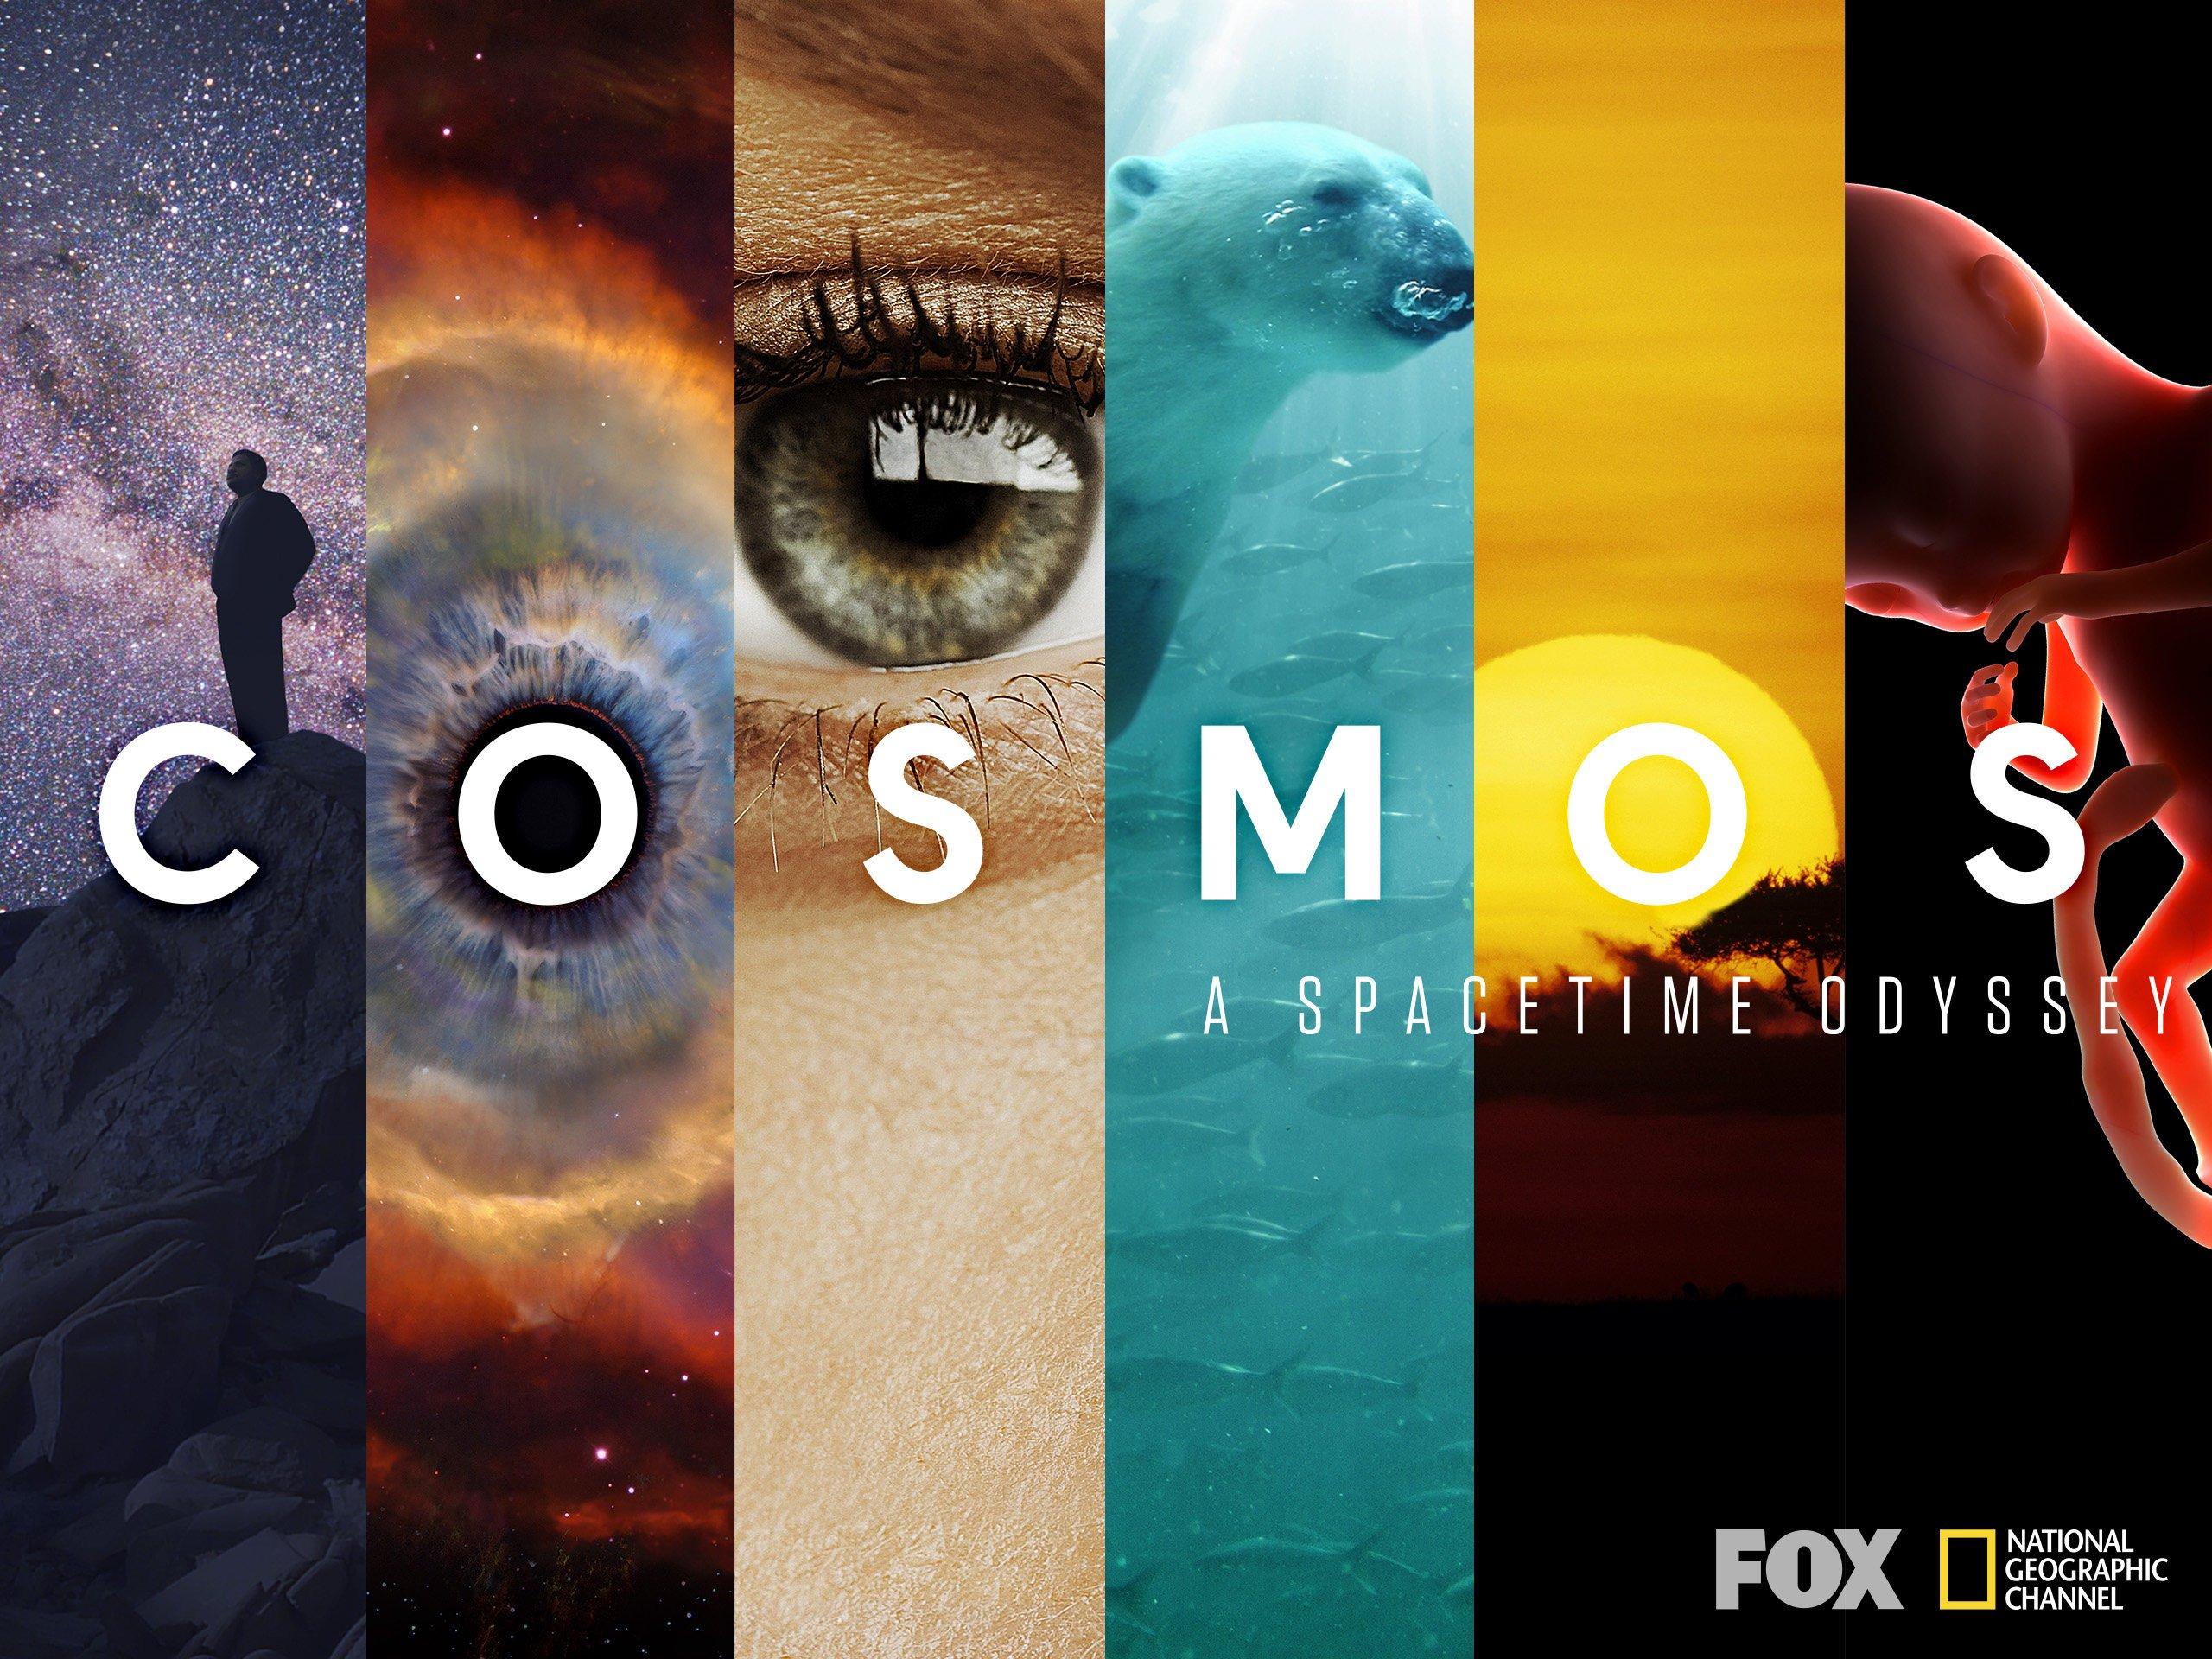 Watch Cosmos A Spacetime Odyssey Season 1 Prime Video